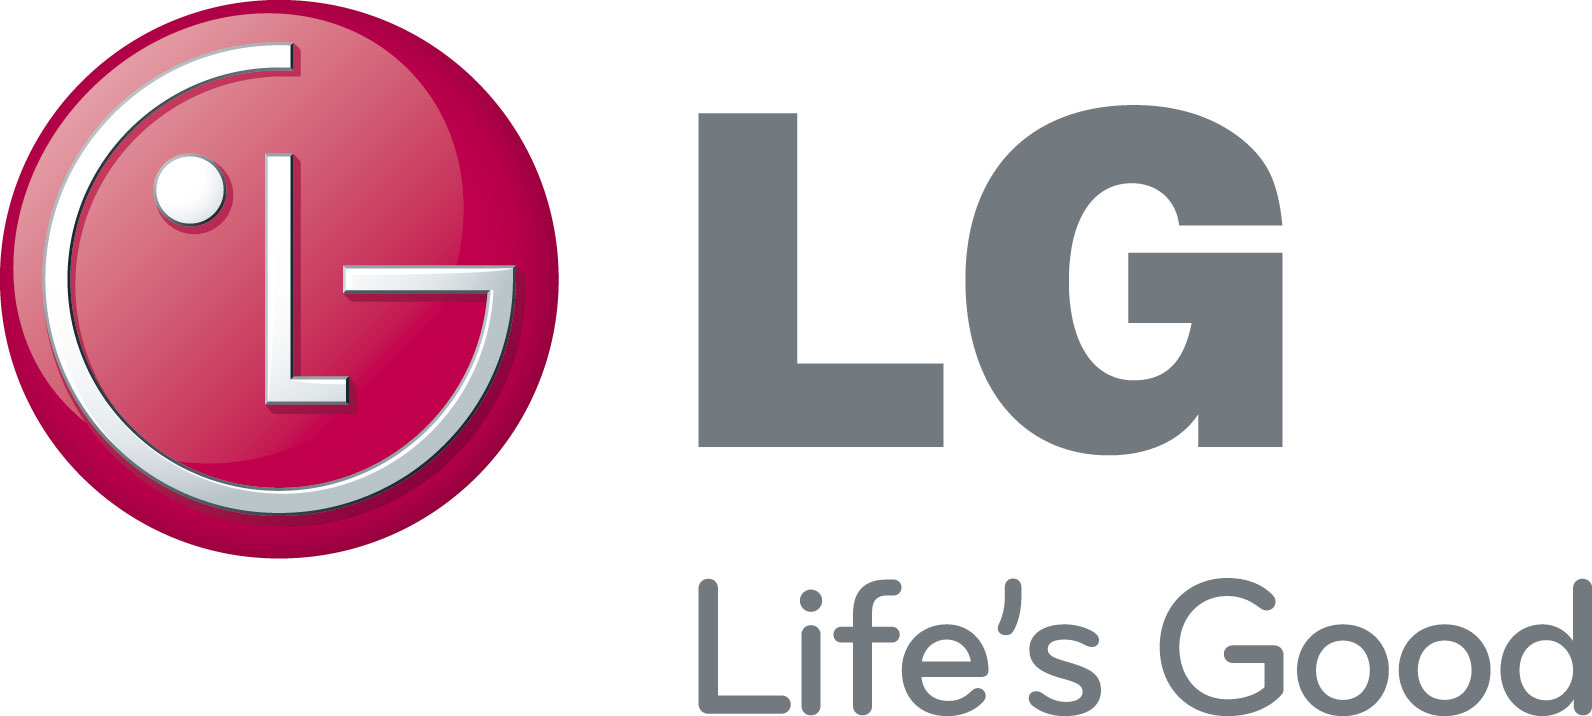 Lg Group Chaebol